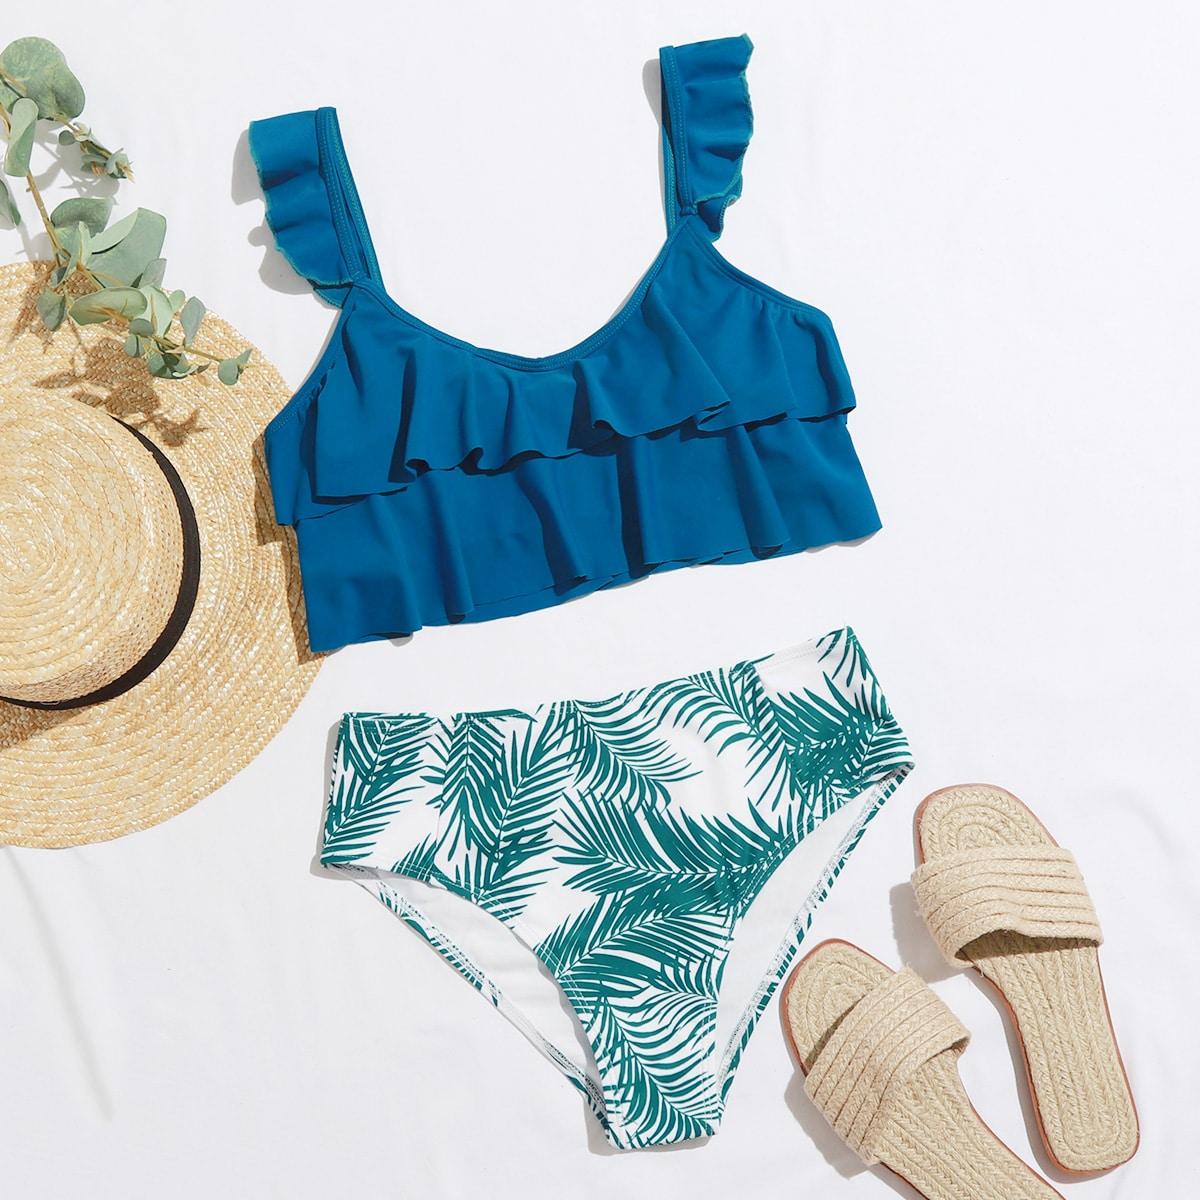 Palm Print Ruffle Bikini Swimsuit, SHEIN  - buy with discount